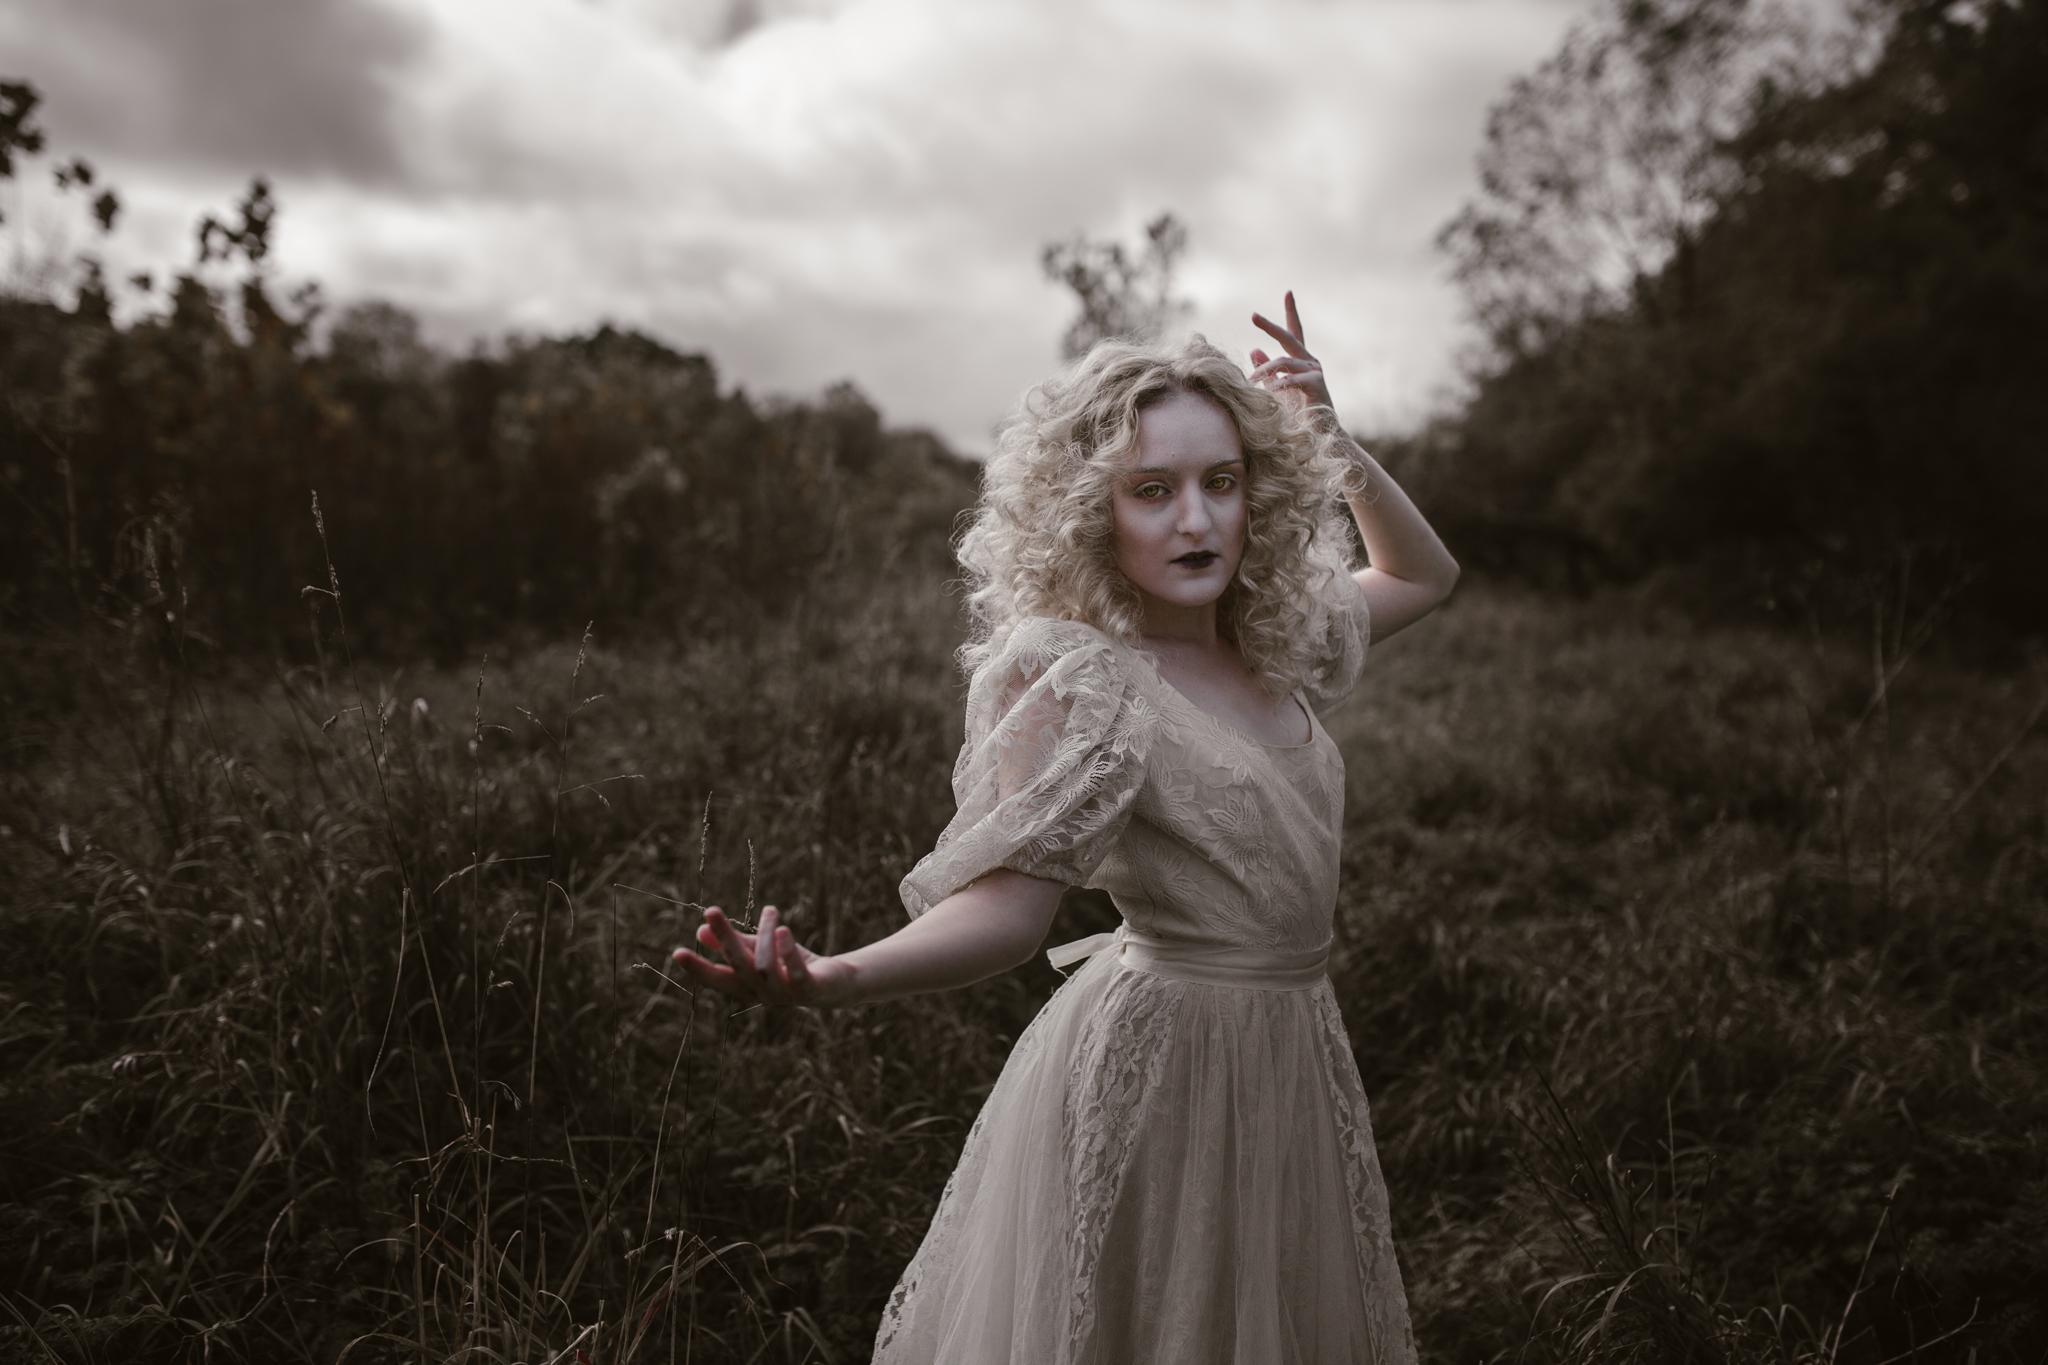 pale-witch-056fb.jpg